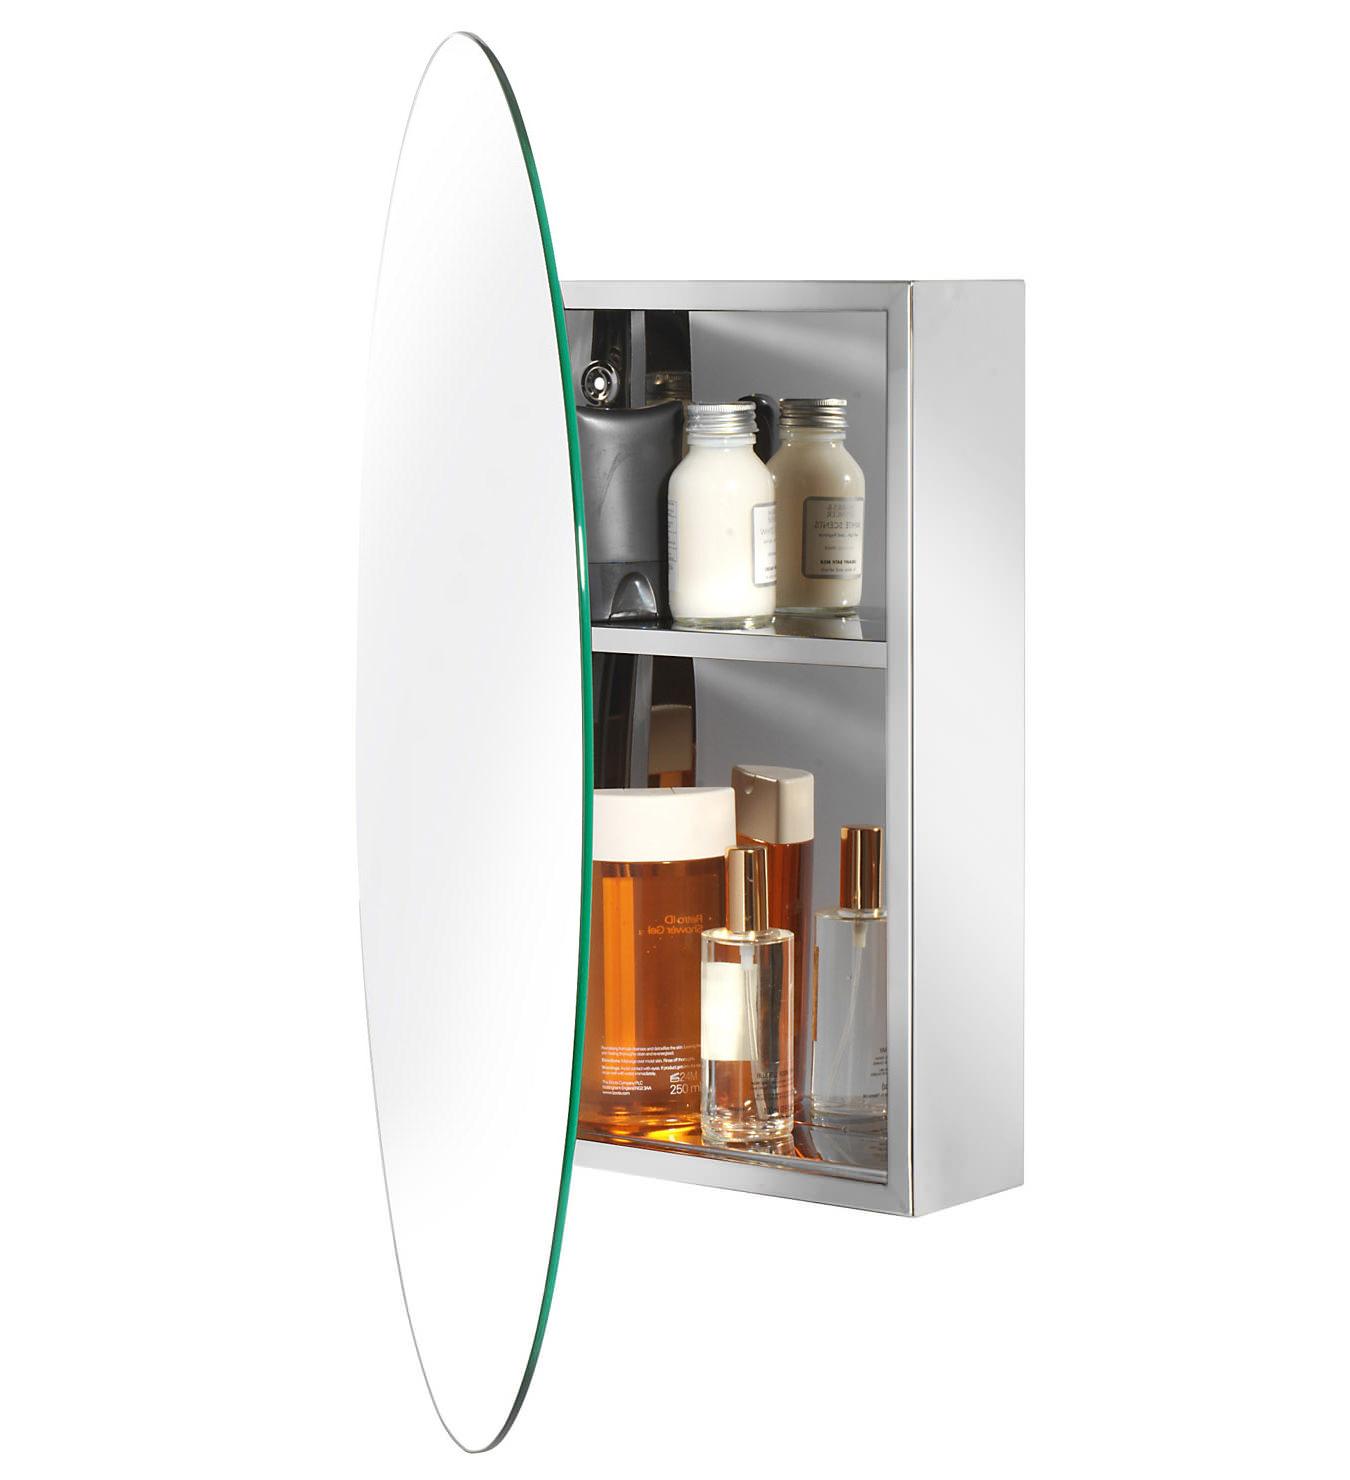 Croydex Tay Stainless Steel Oval Door Mirror Cabinet Wc870105: oval bathroom mirror cabinet